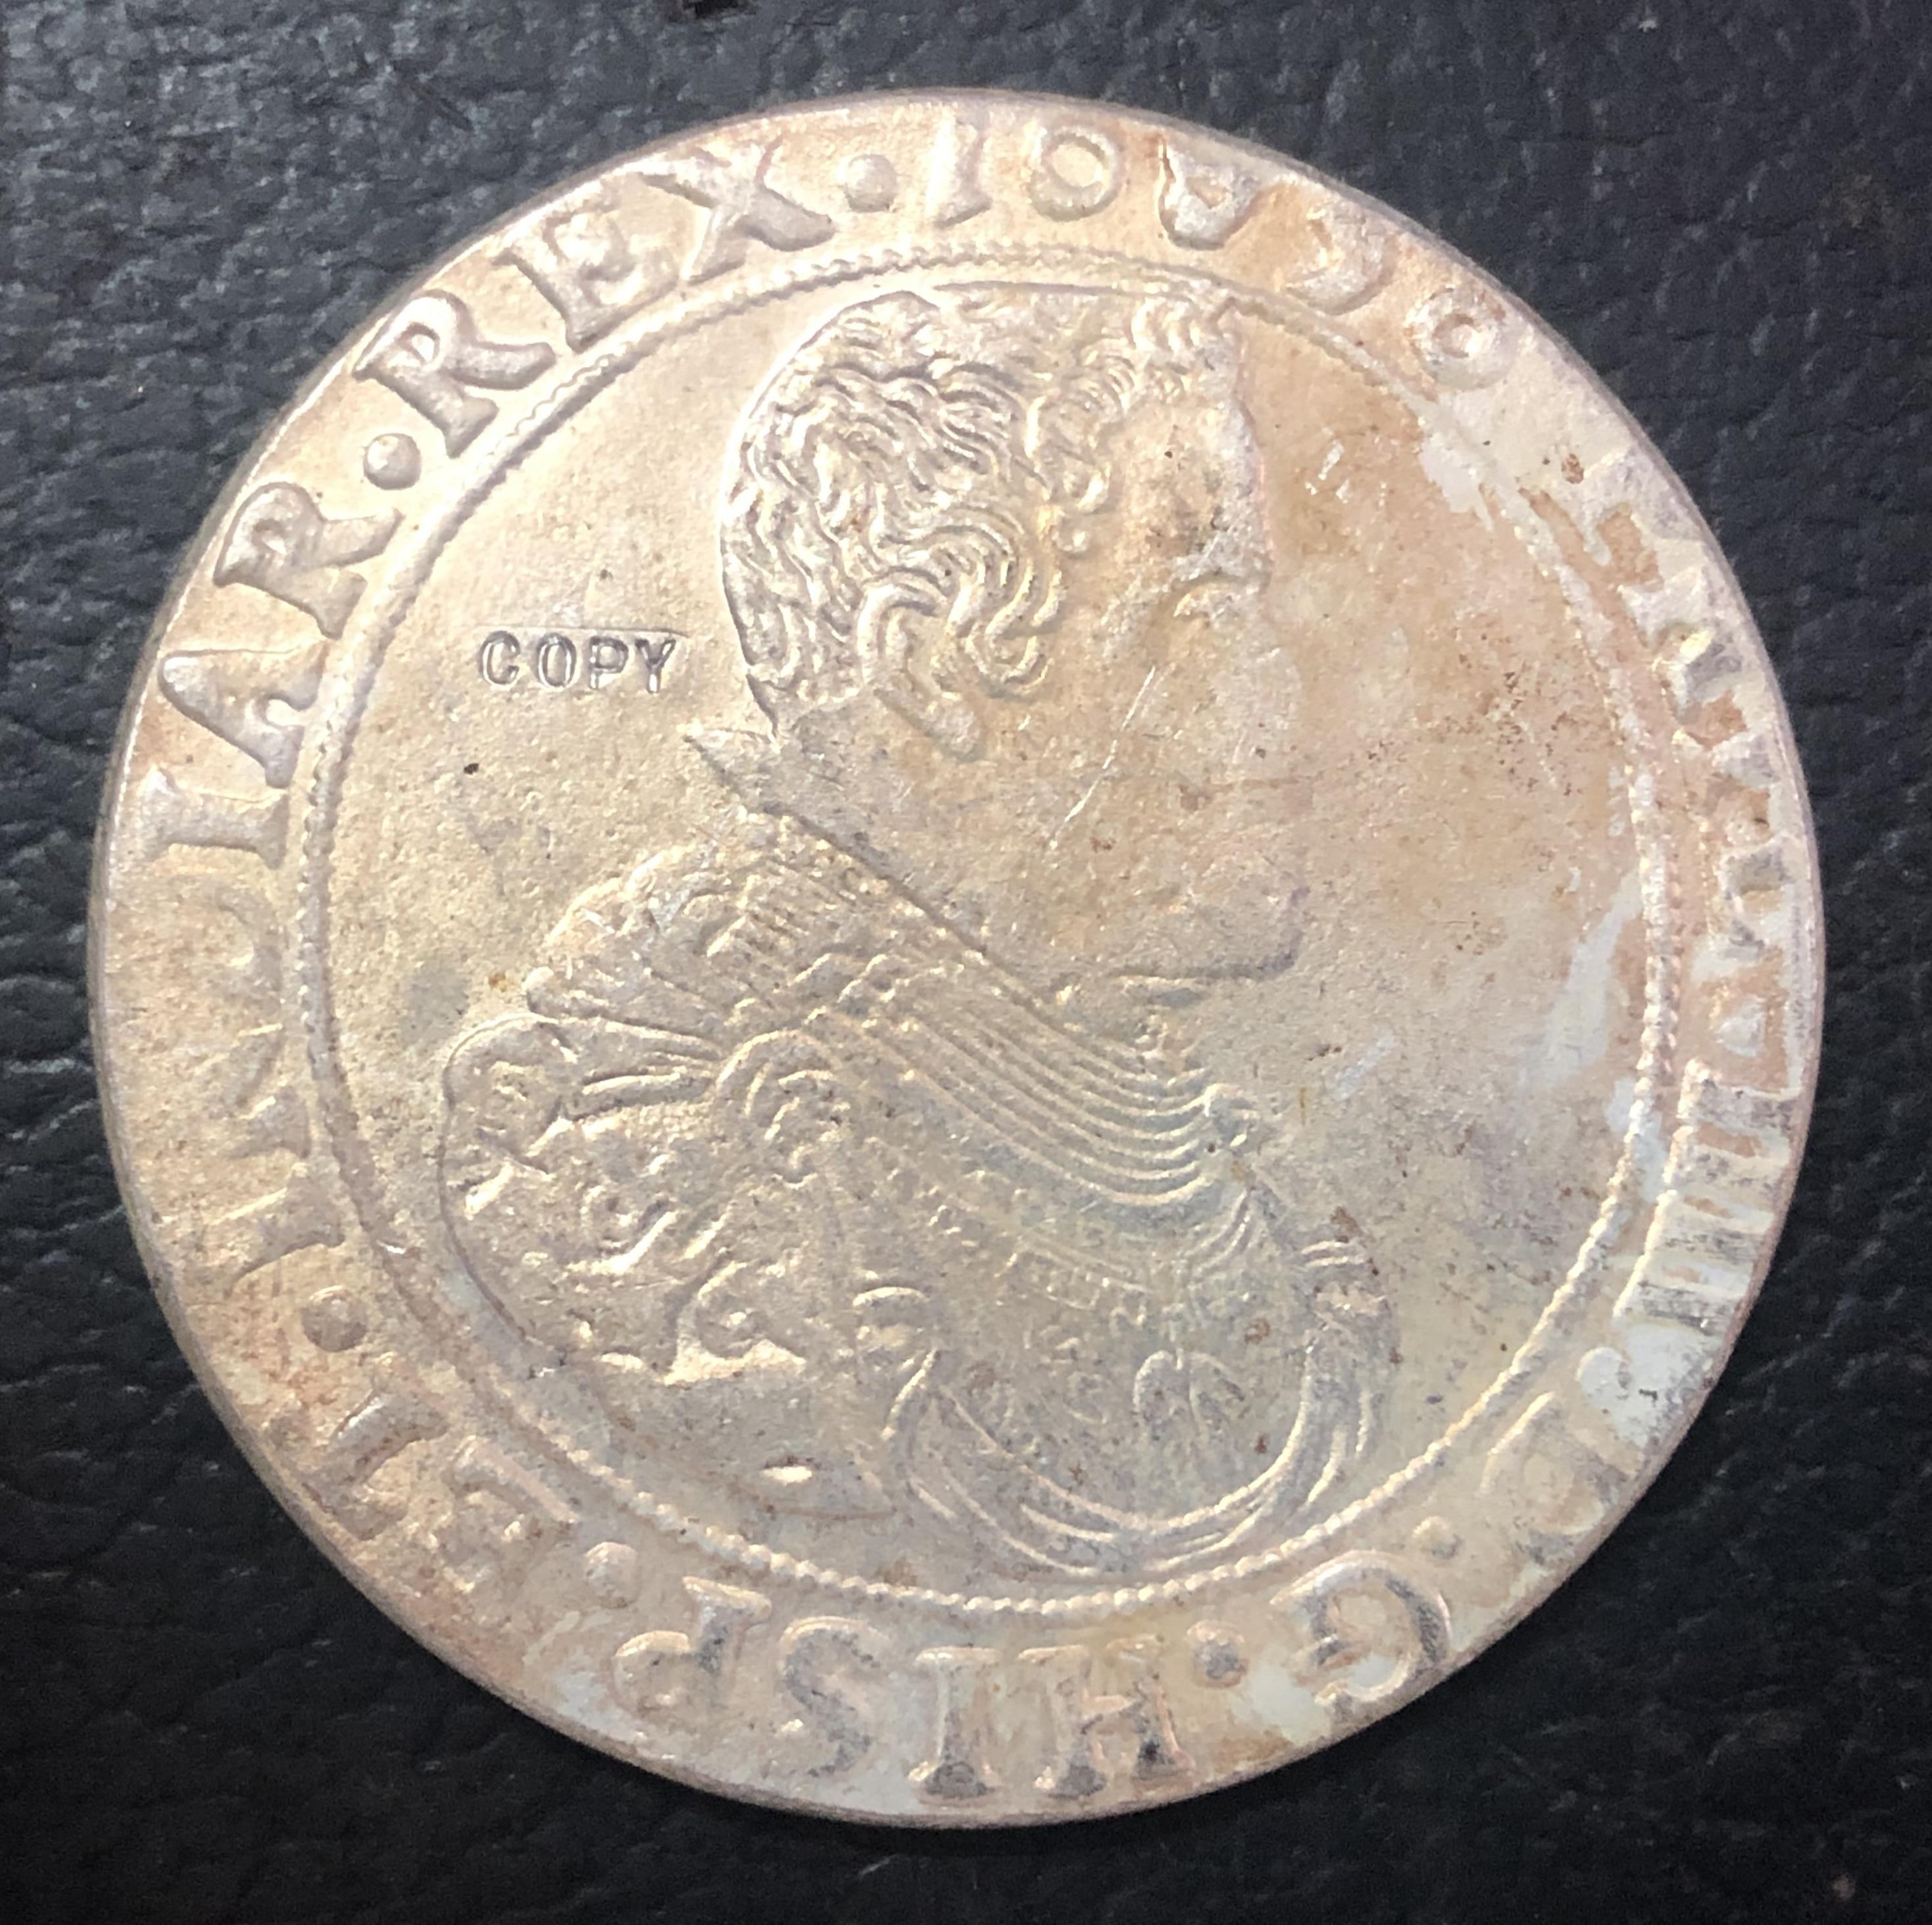 1656 Países Bajos españoles (Brabant) 1 ducaton-philip IV